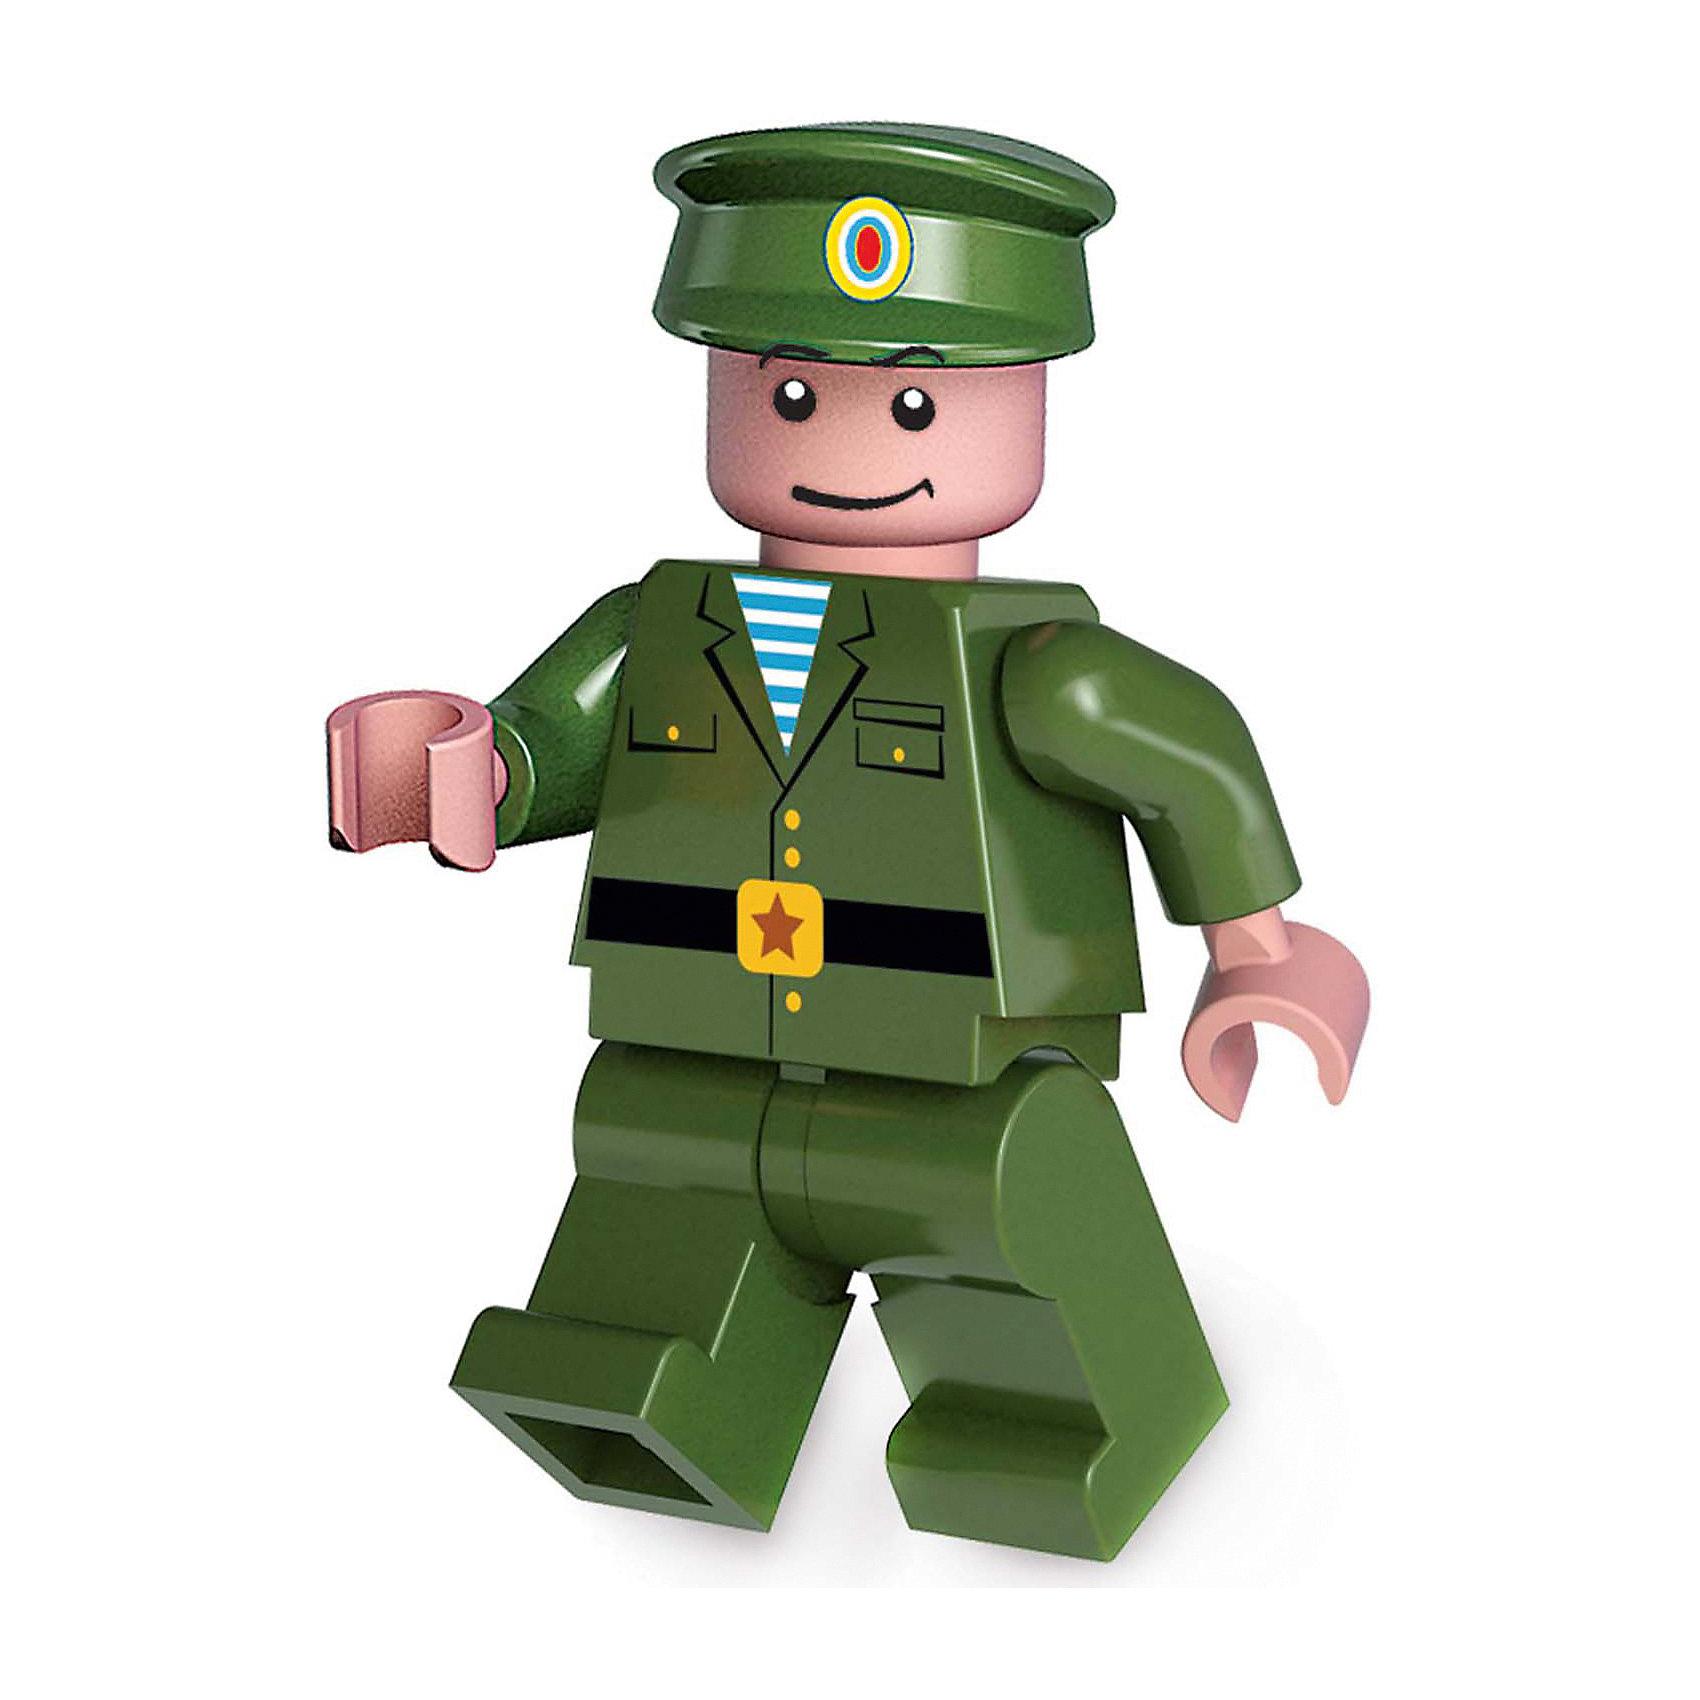 Игрушечный солдат картинка